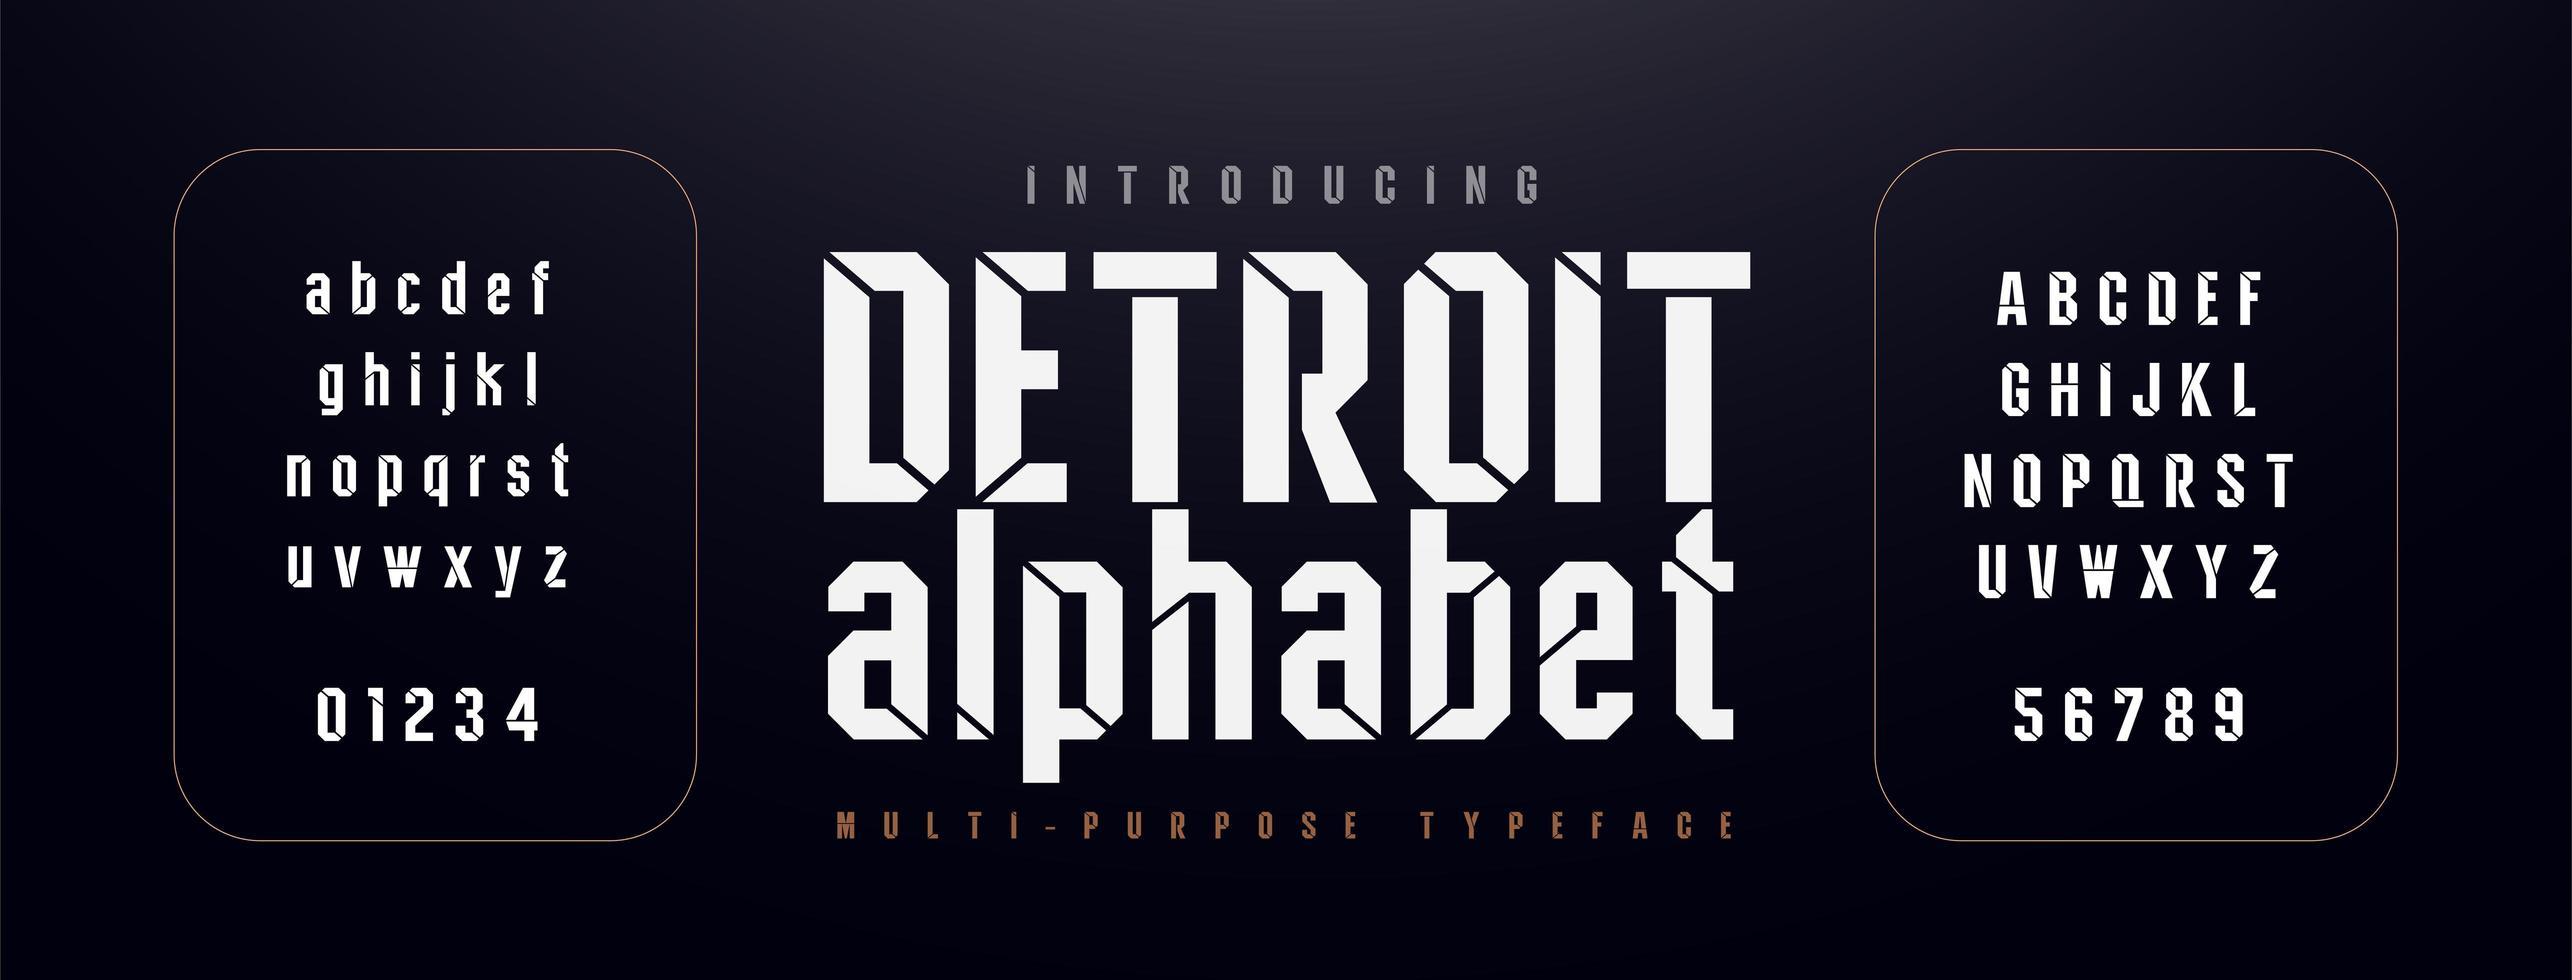 stedelijke moderne alfabet lettertype vector